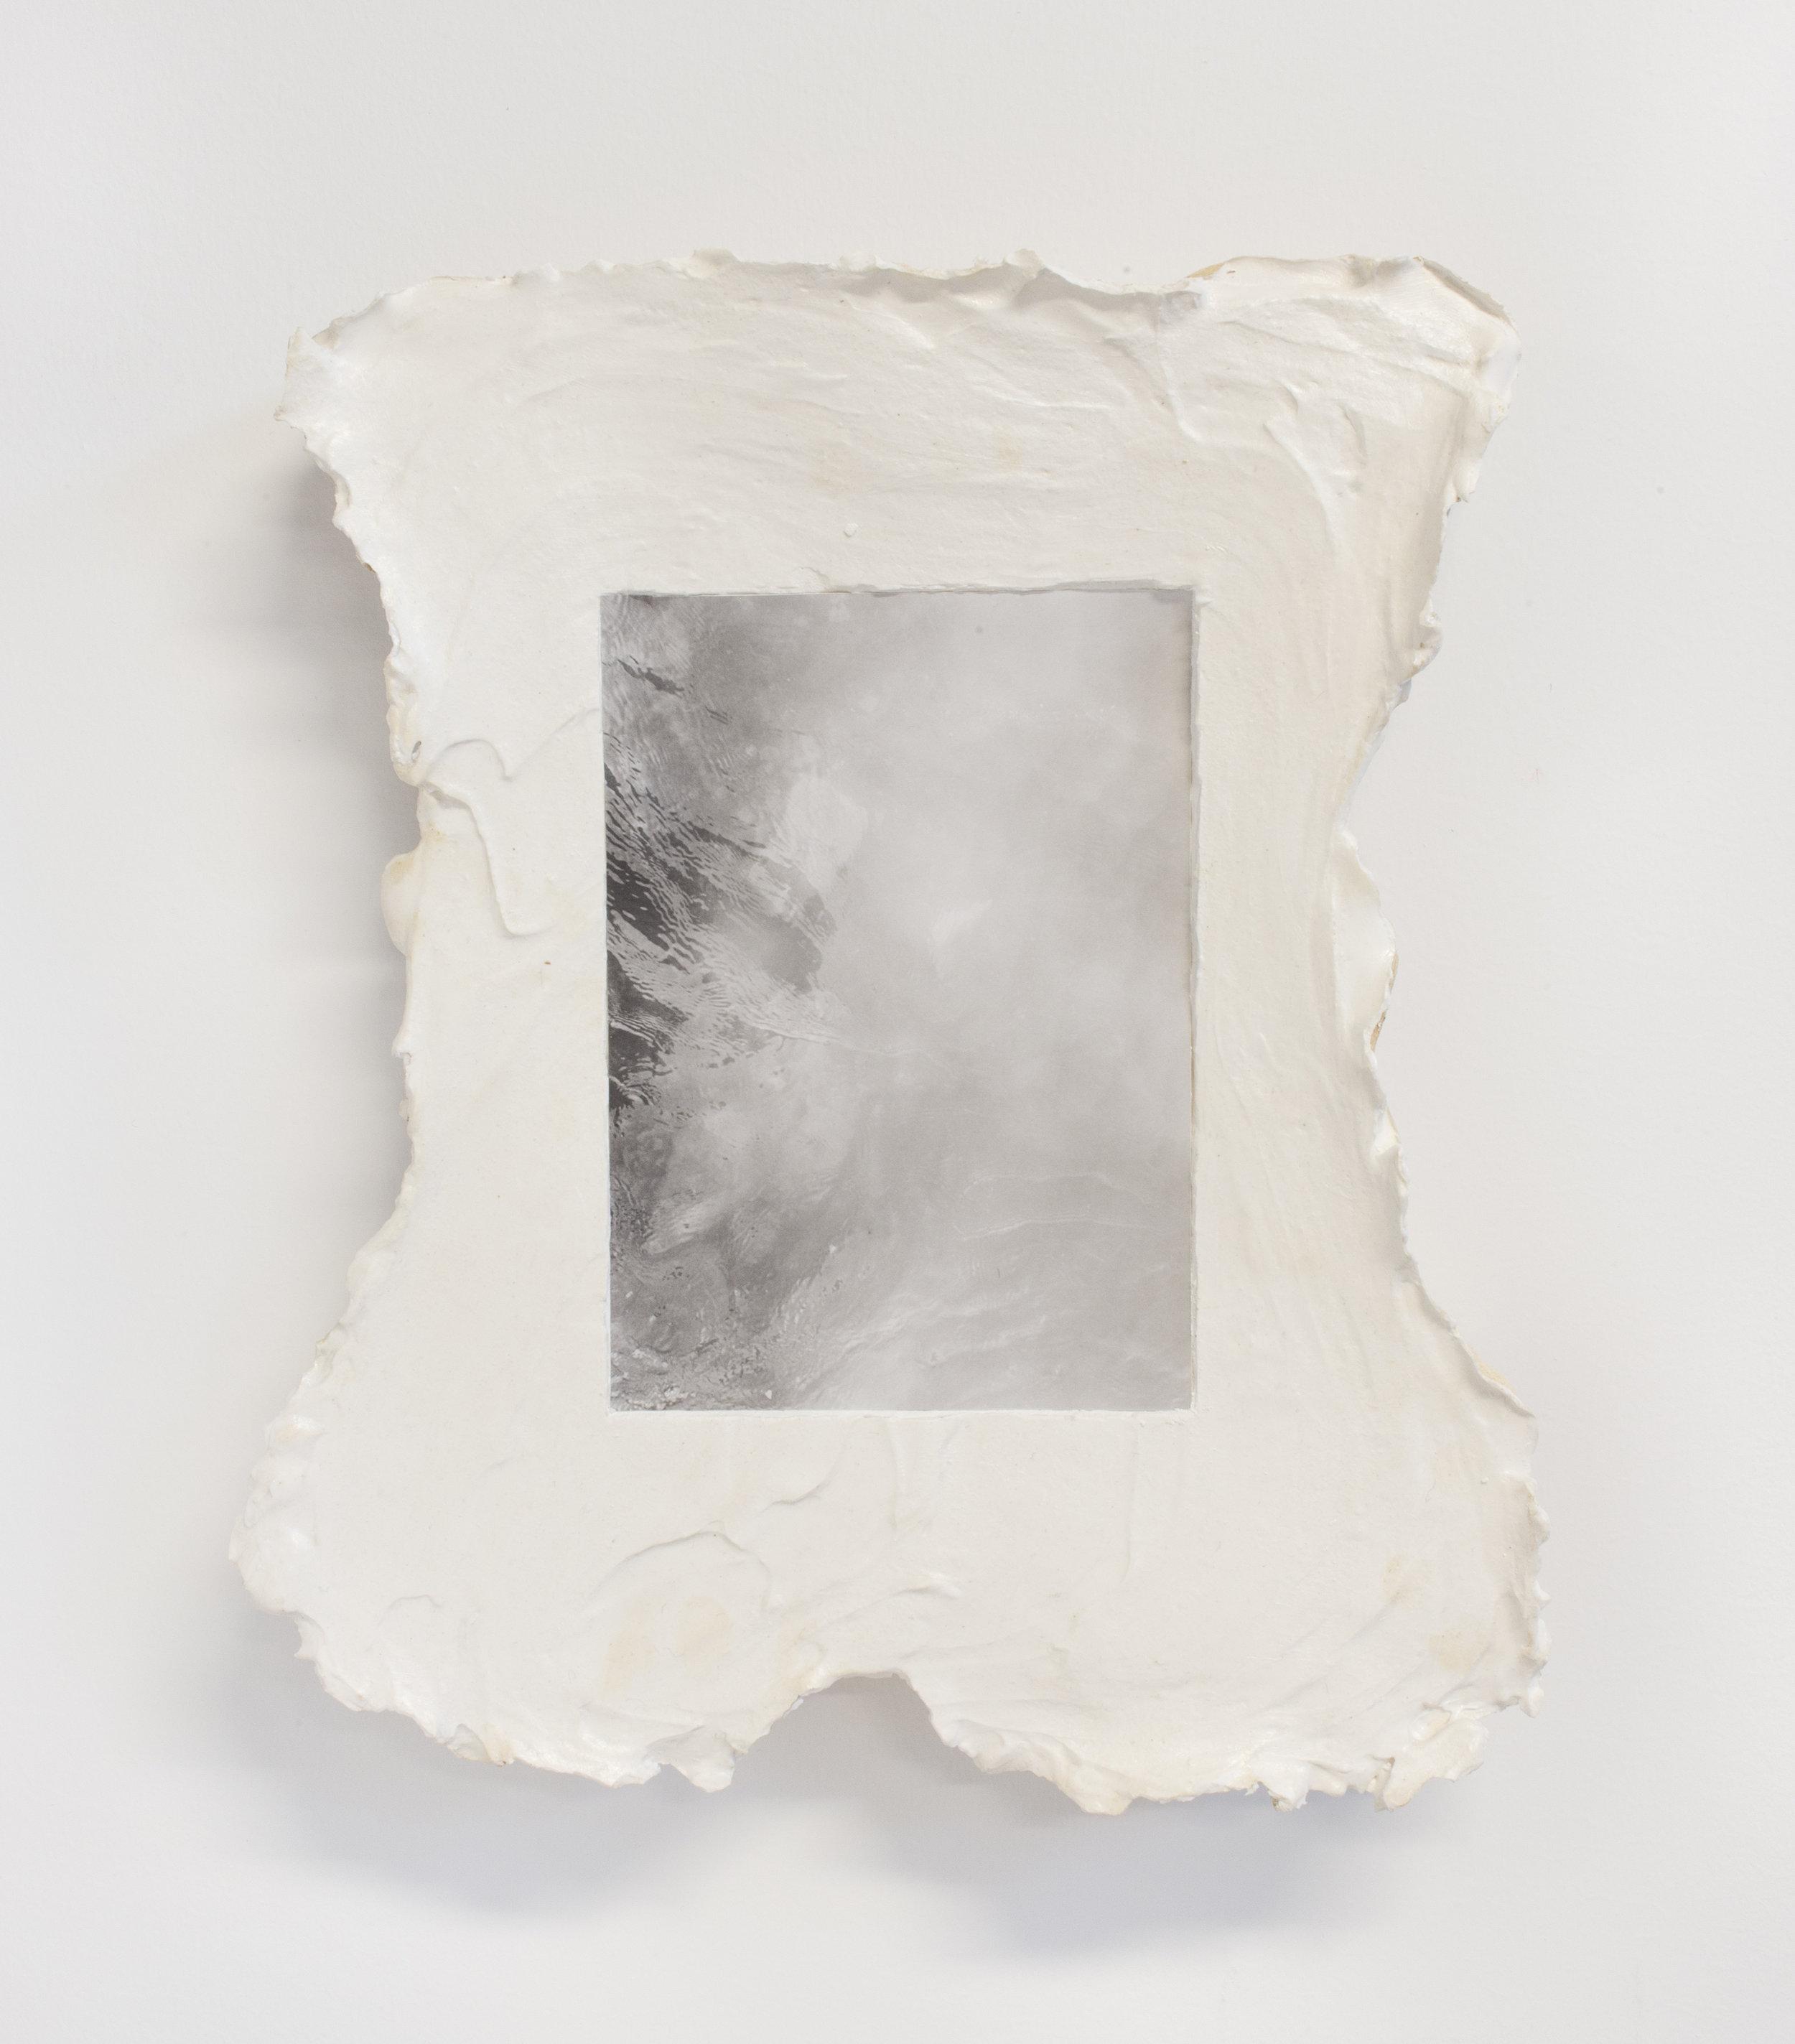 2018, Plaster, silver gelatin print, wax, 13 x 10.5 x 2 inches